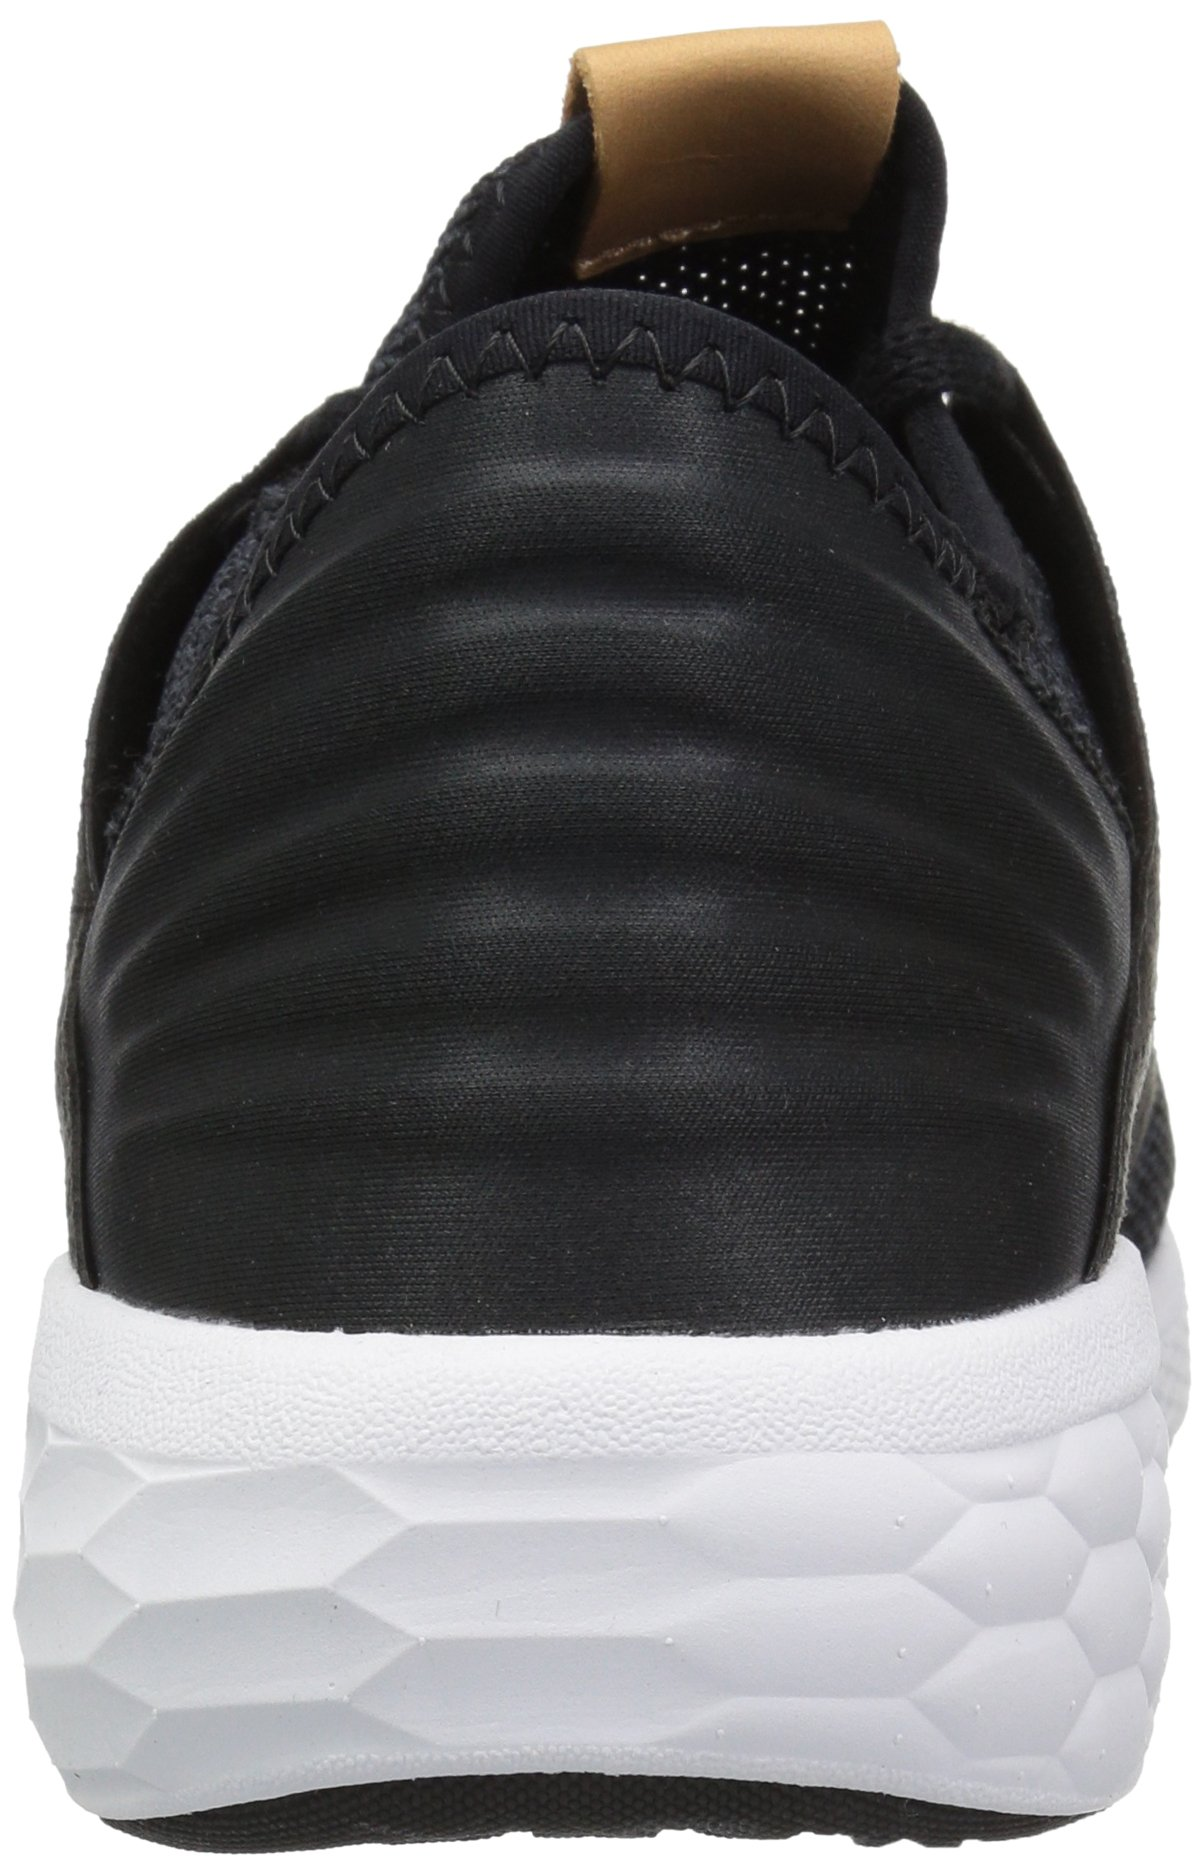 New Balance Men's Cruz V2 Fresh Foam Running Shoe, black/white, 7 D US by New Balance (Image #2)